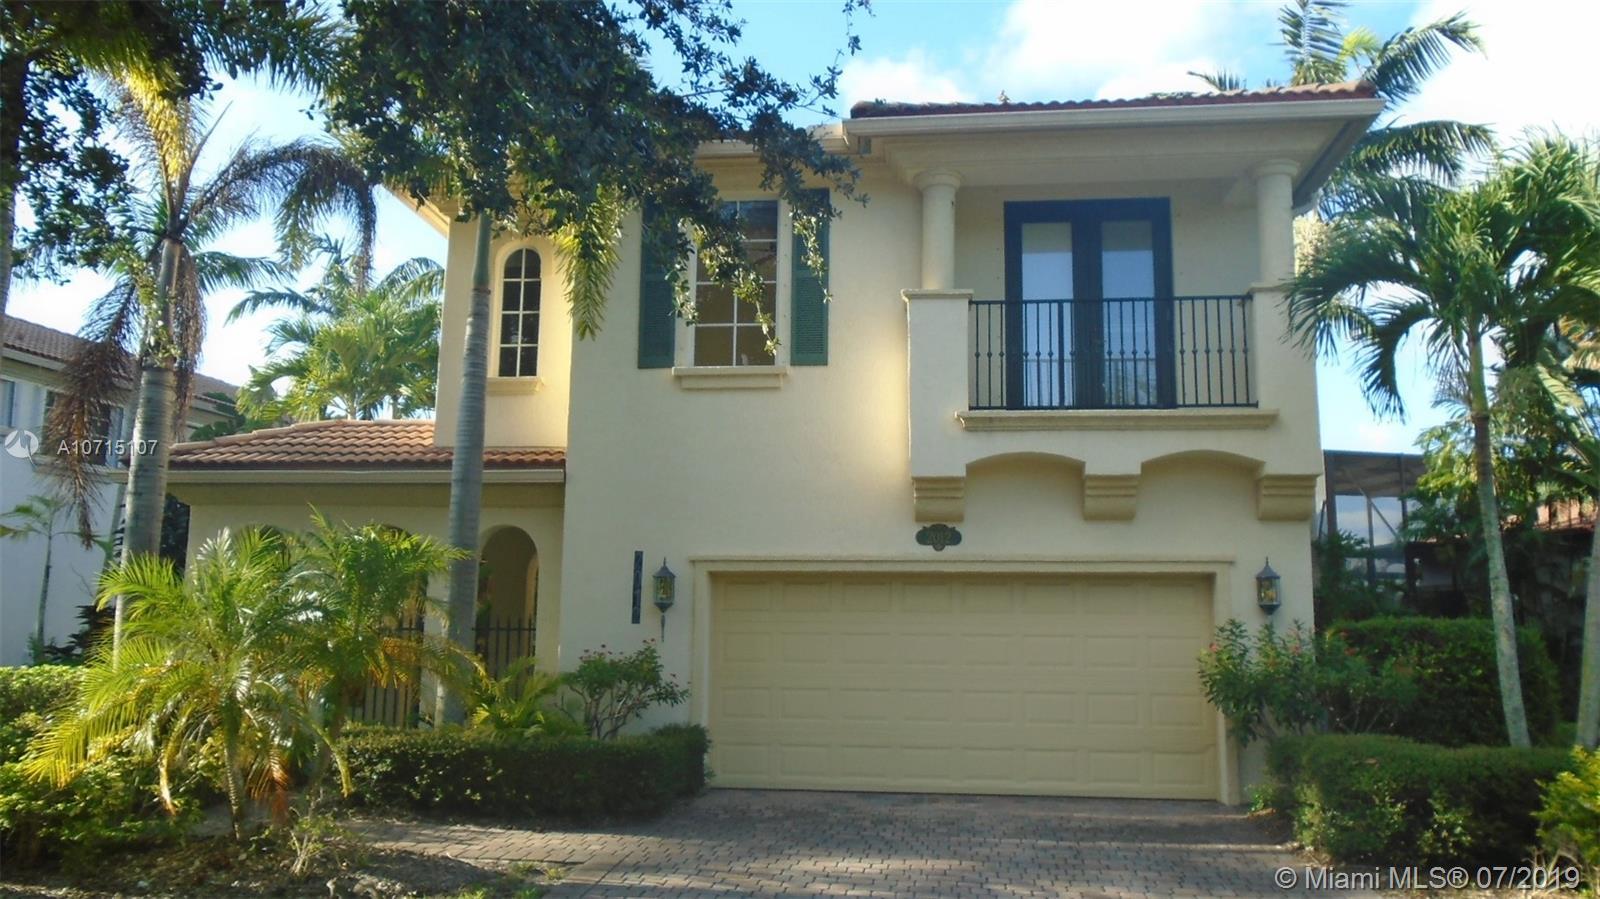 2012 Graden Dr, Palm Beach Gardens, FL 33410